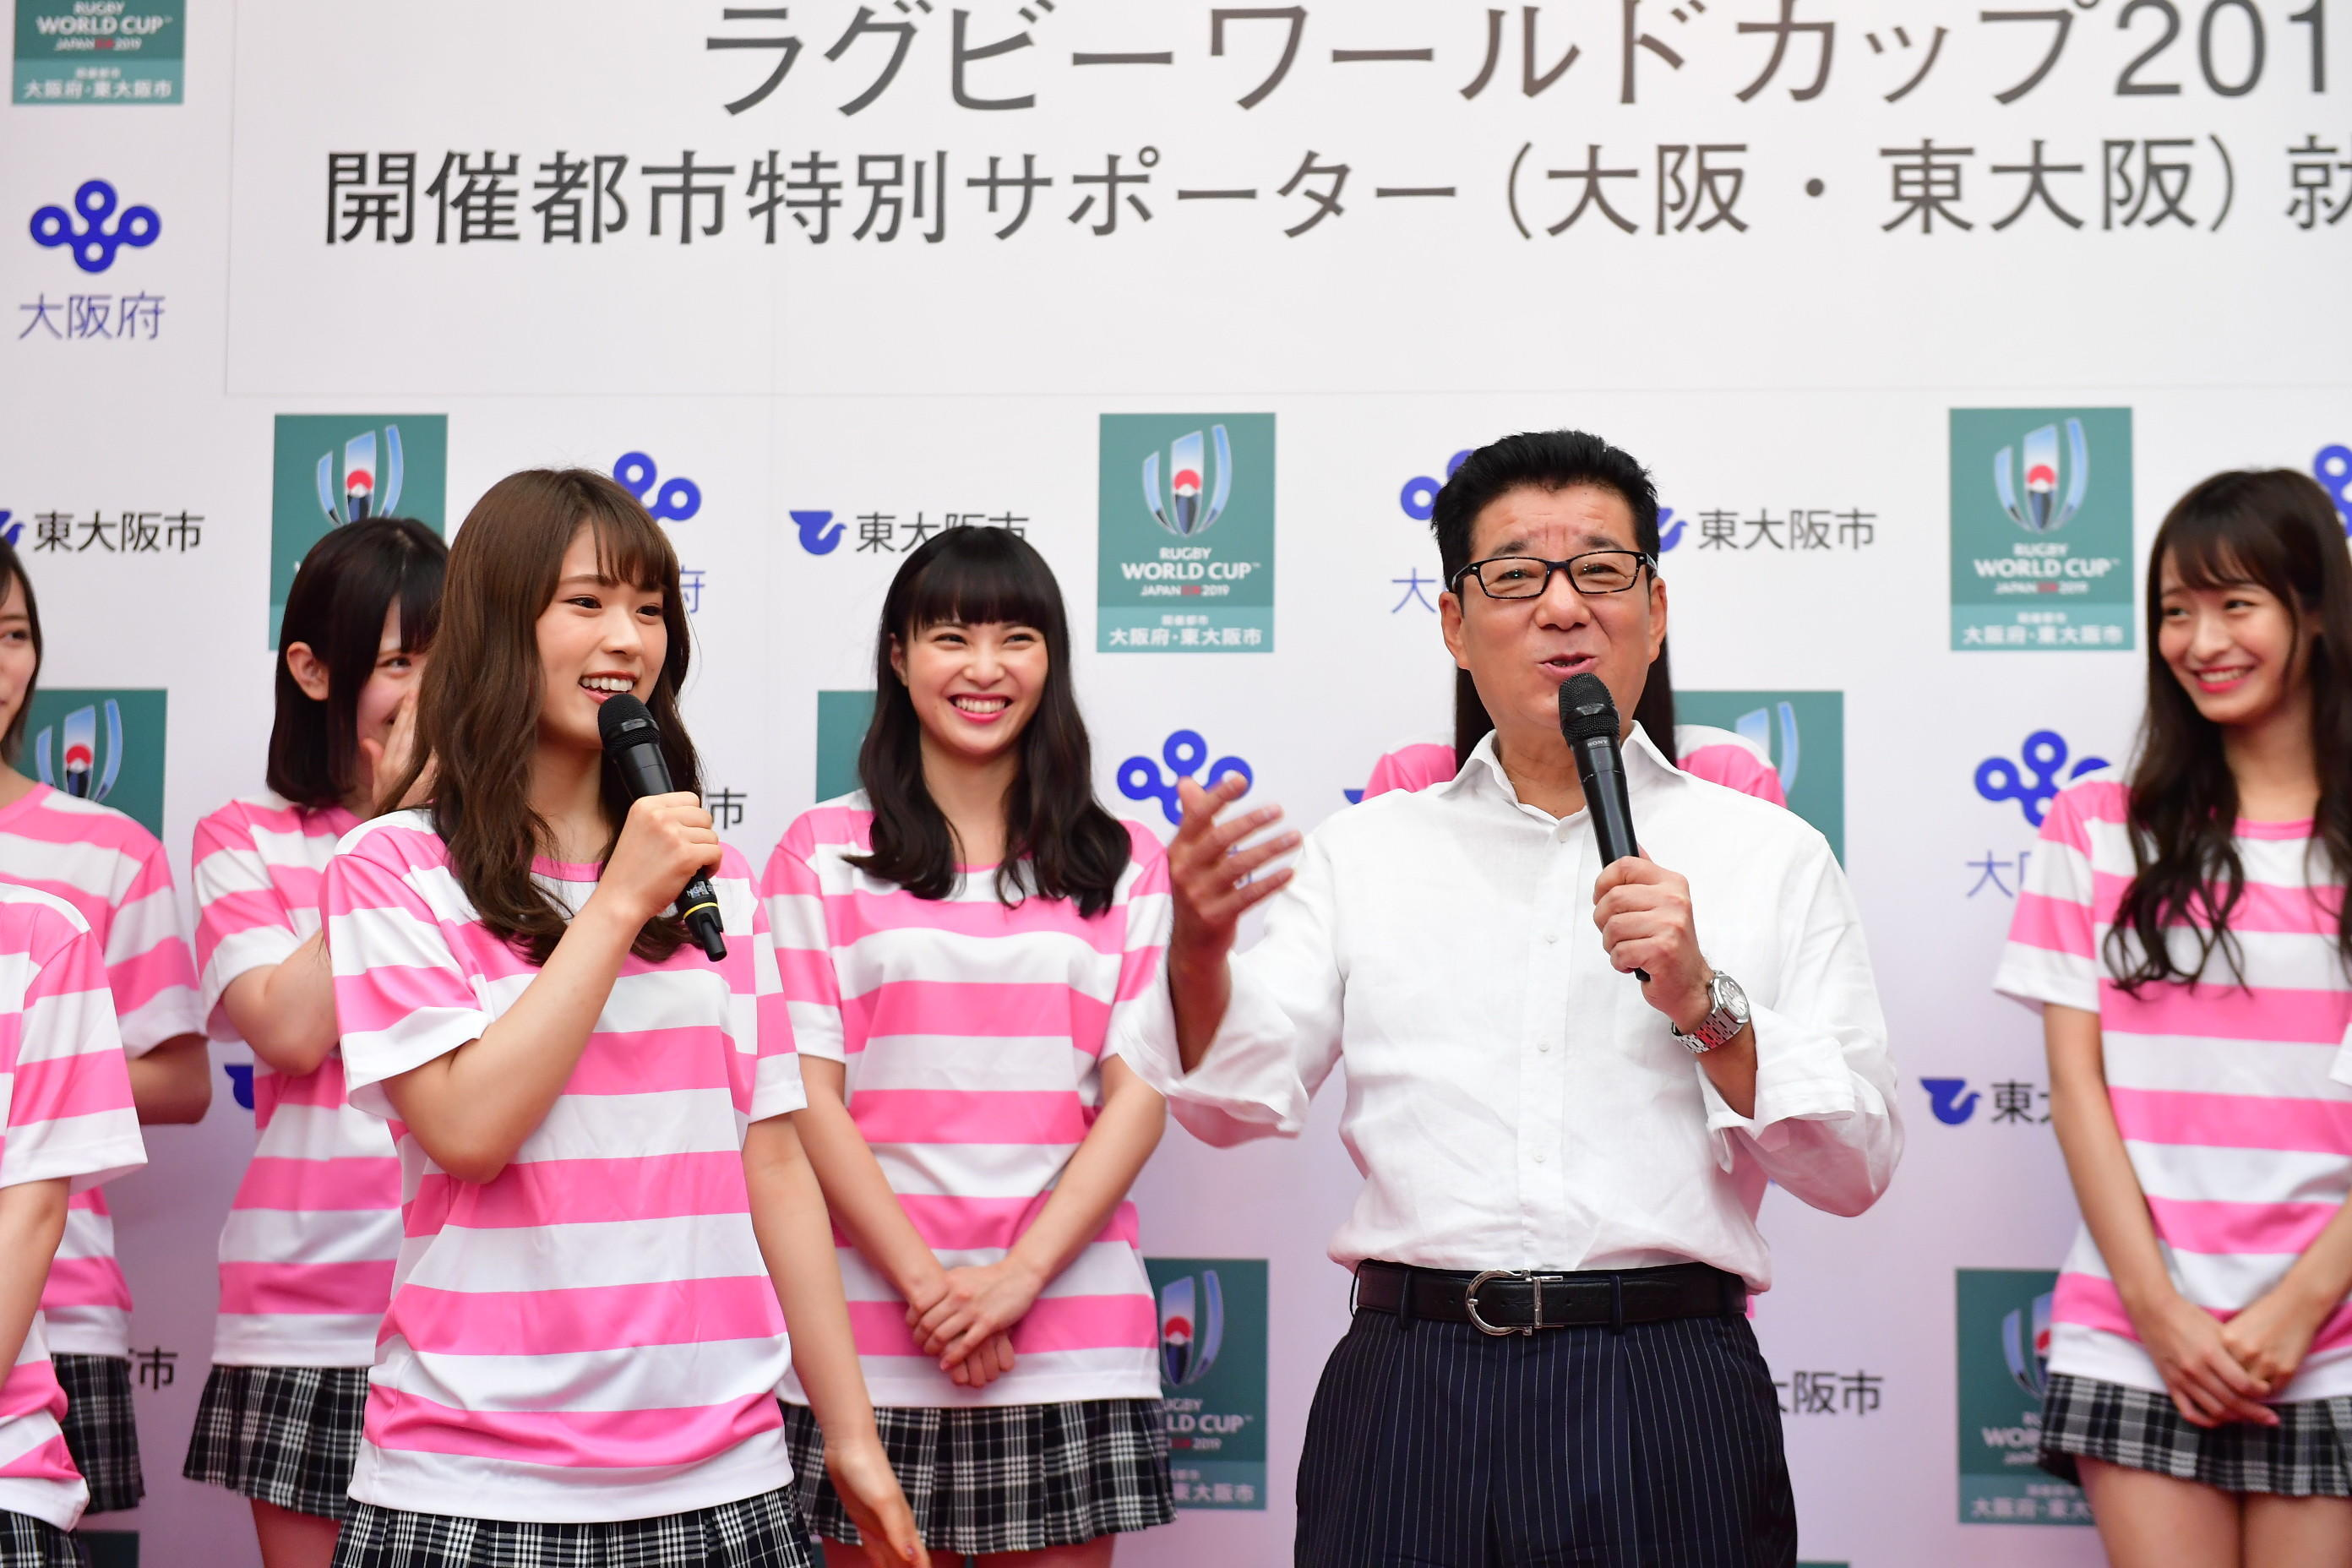 http://news.yoshimoto.co.jp/20180919085248-808688695a9fb64f41a6ad7dd88fbaef7f3839b0.jpg